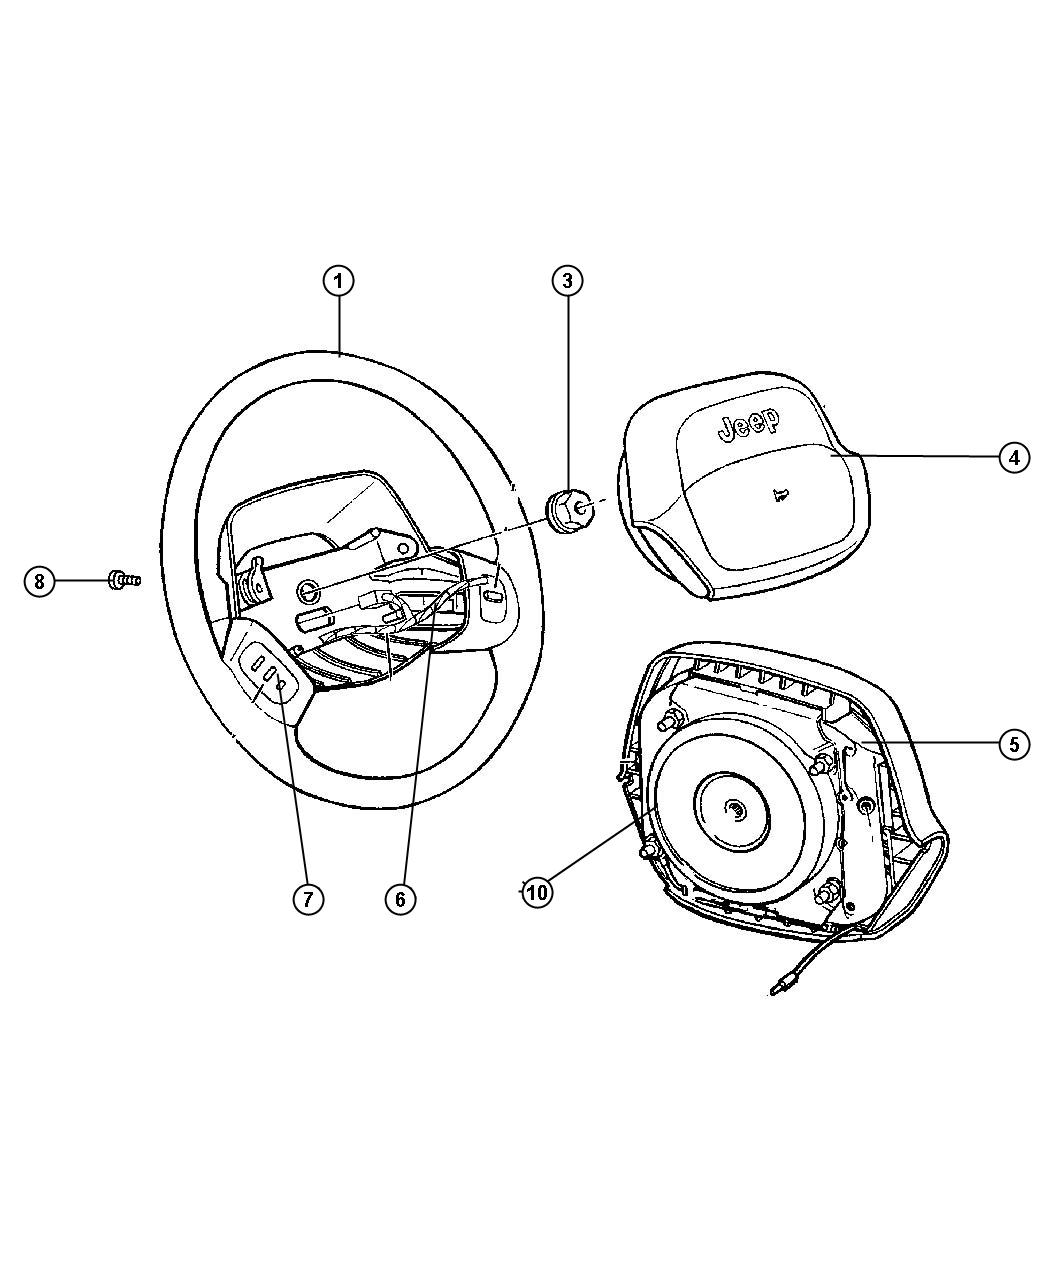 5gk431azab jeep wheel steering discontinued. Black Bedroom Furniture Sets. Home Design Ideas